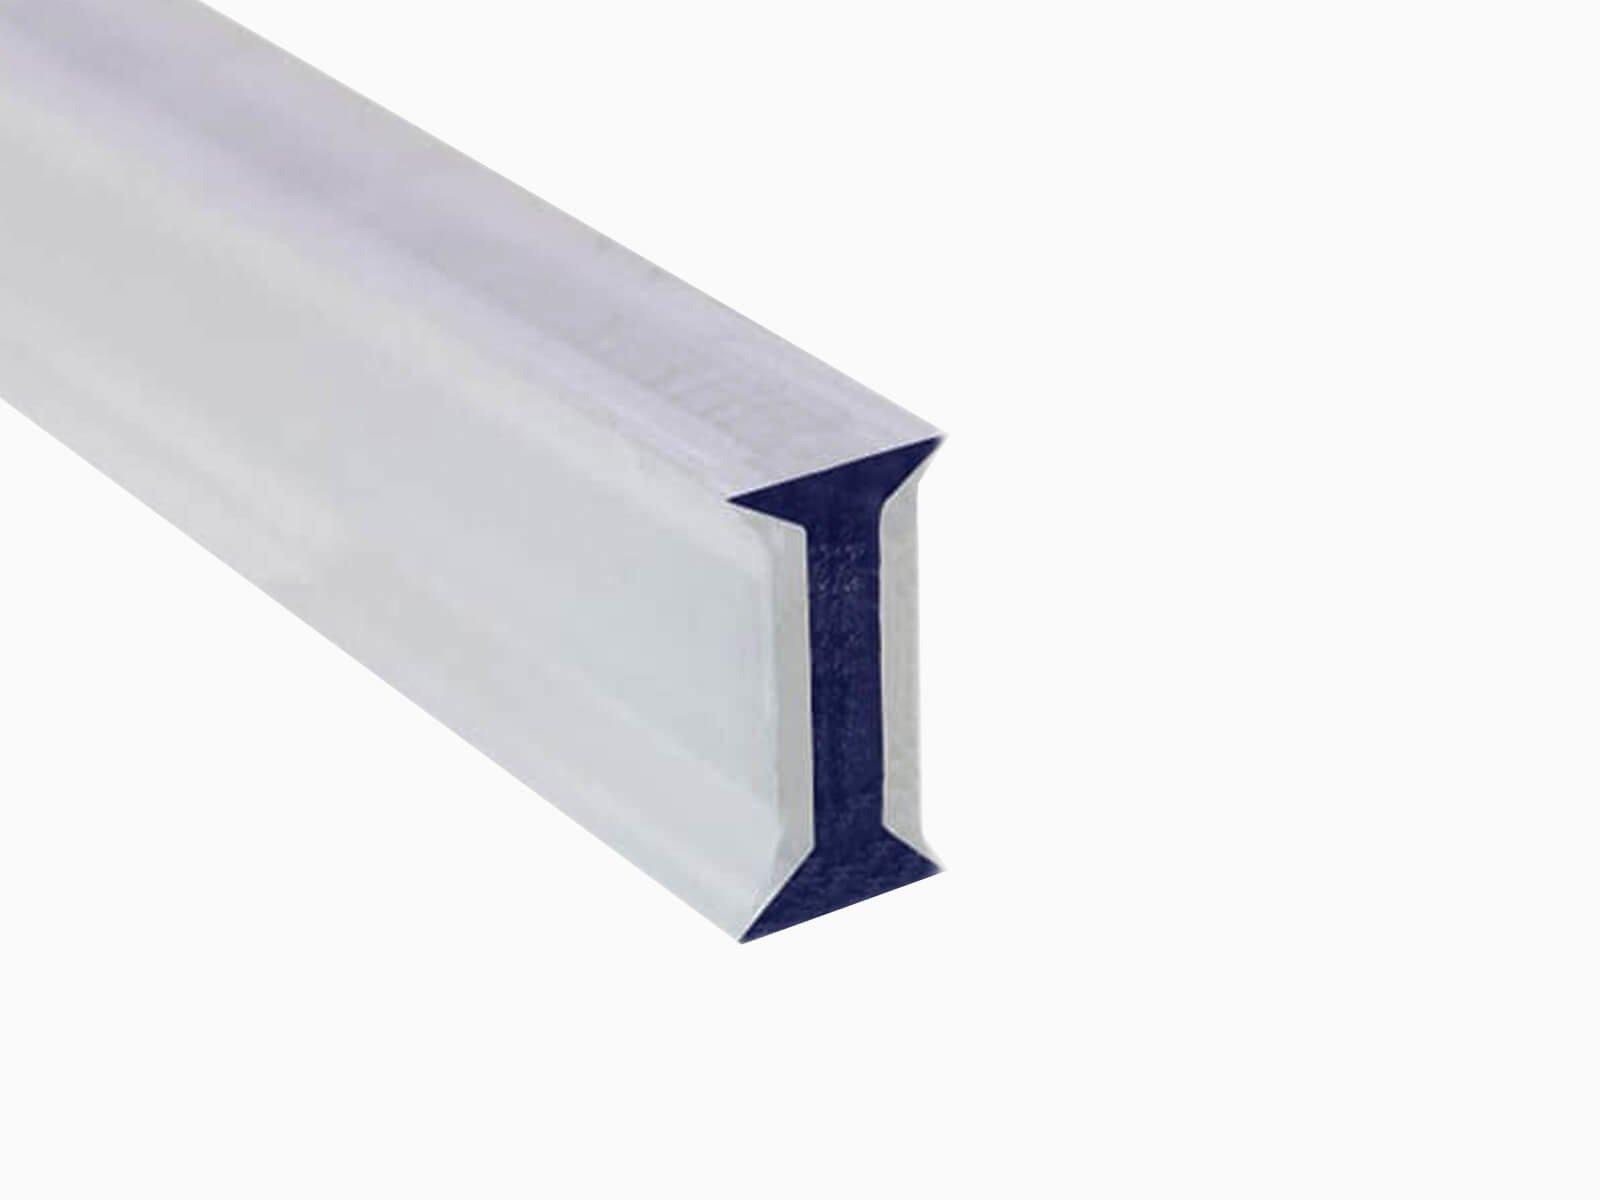 Kunststoffprofil für Glastrennwand im Industrie Look